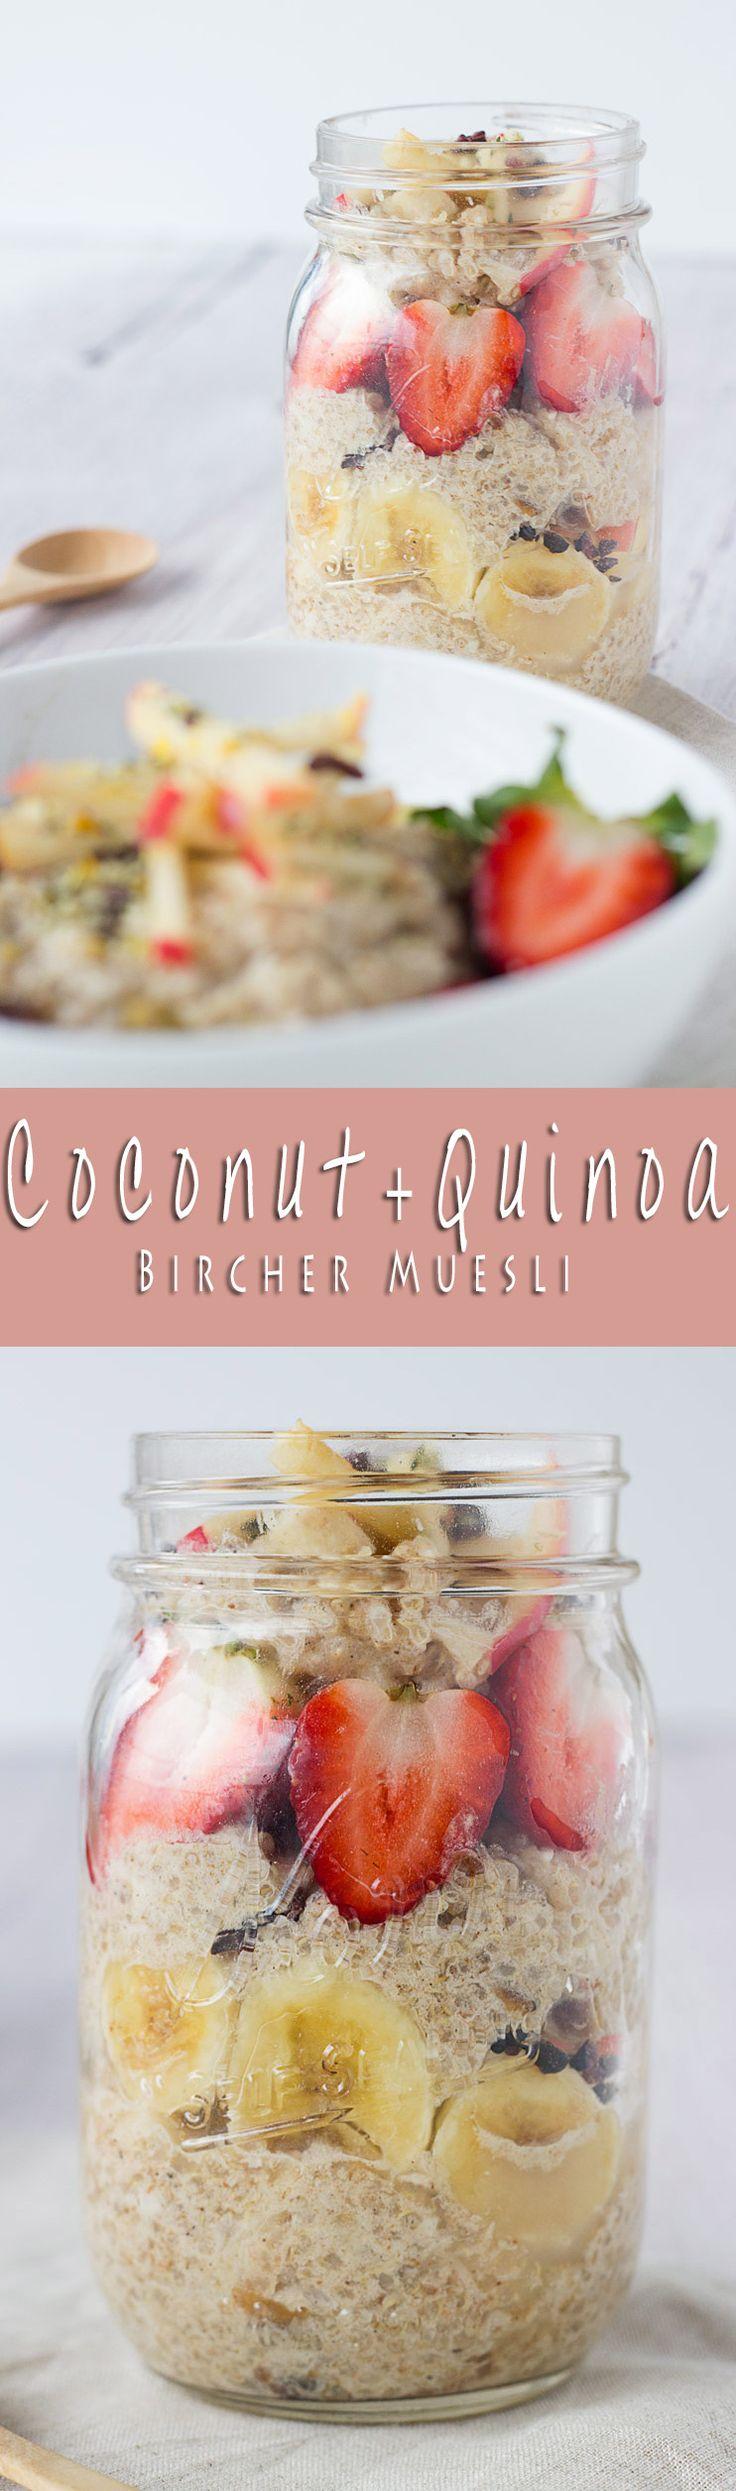 Overnight Coconut + Quinoa Bircher! So delicious, and gluten-free and vegan as well!